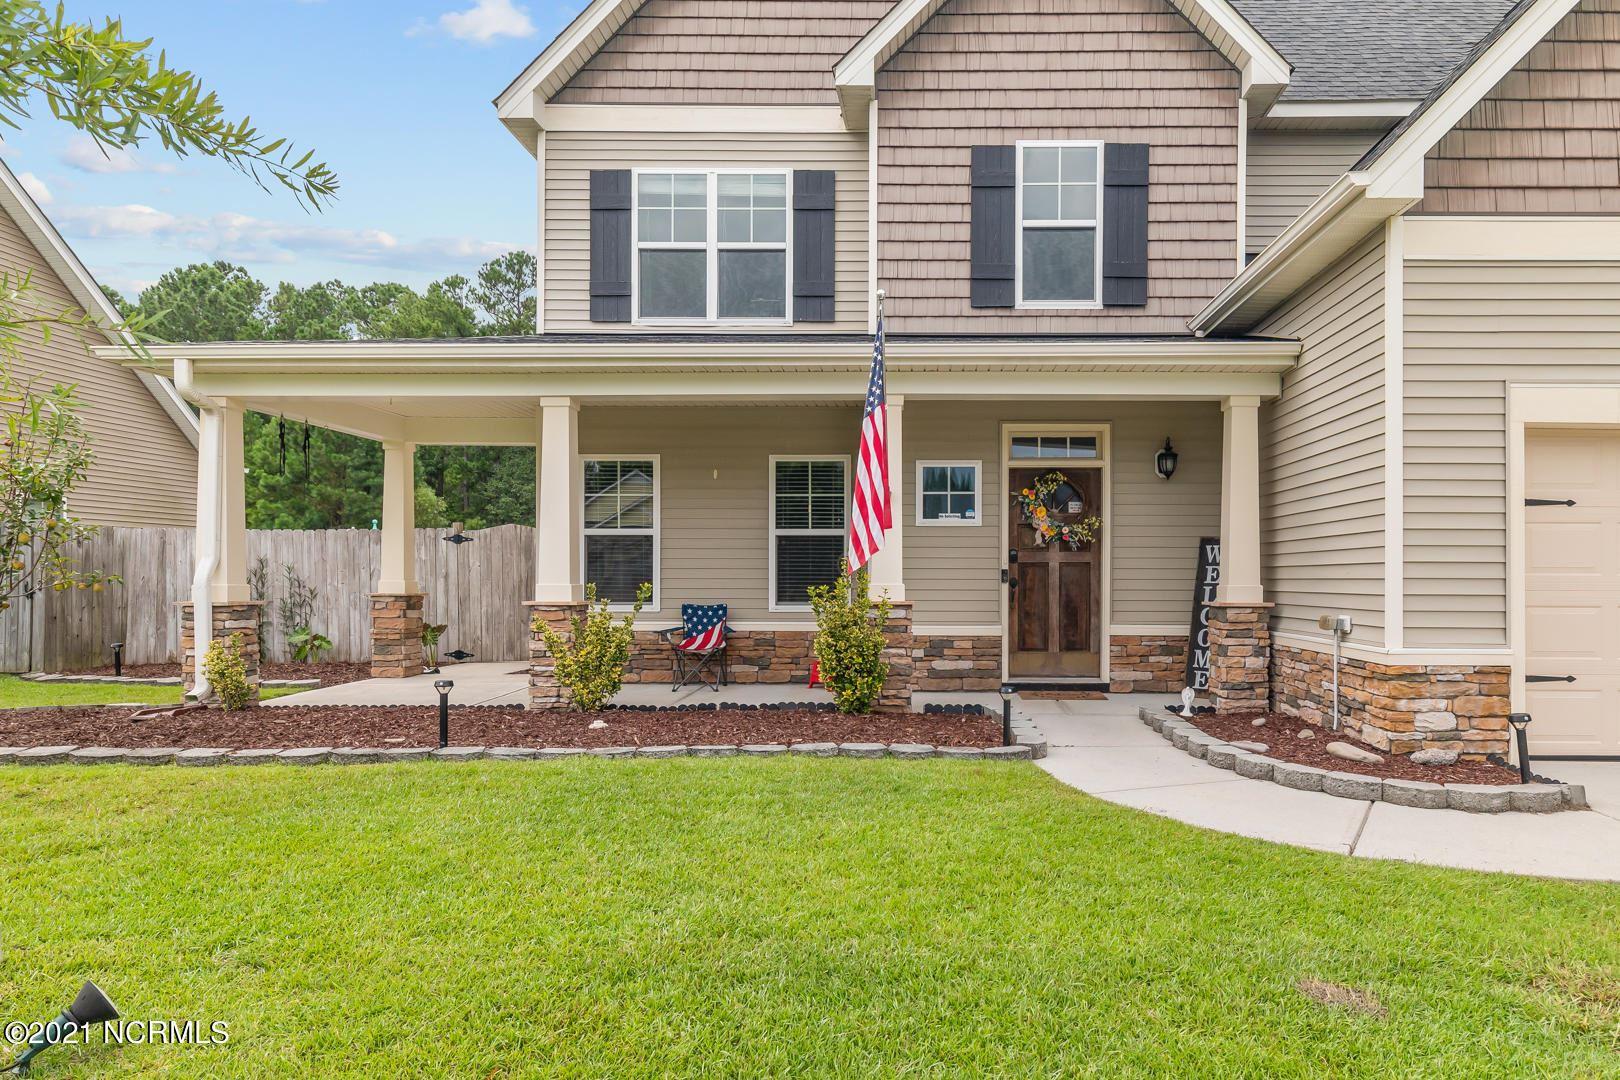 Photo of 405 Savannah Drive, Jacksonville, NC 28546 (MLS # 100287678)